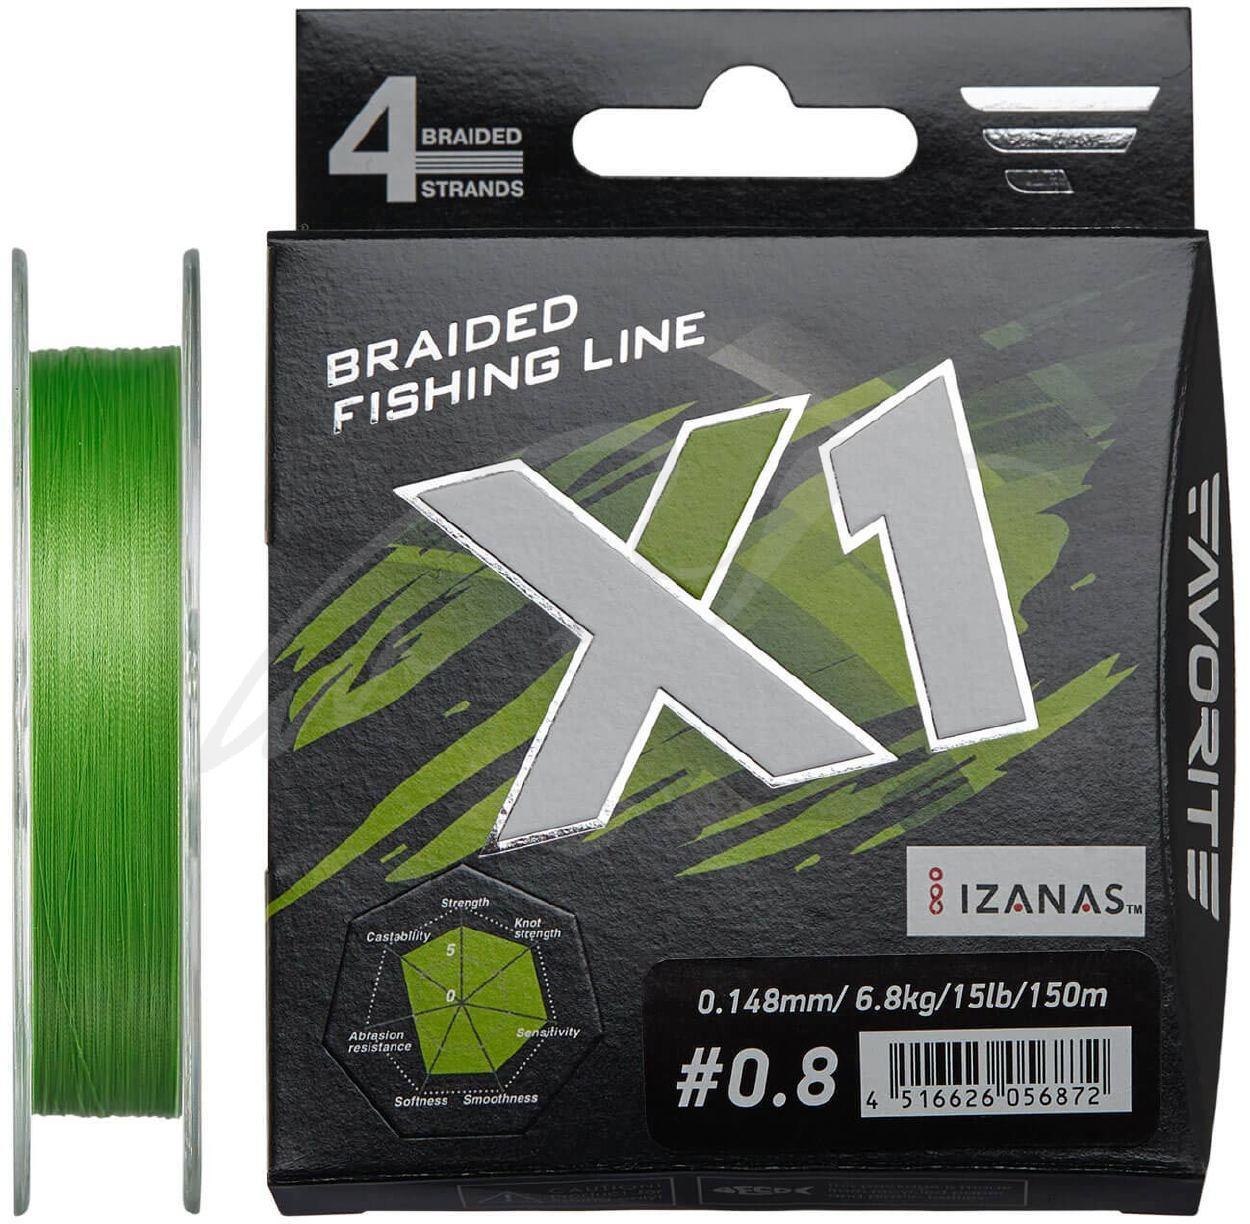 Шнур Favorite X1 PE 4x 150m (l.green) #0.8/0.148mm 15lb/6.8kg